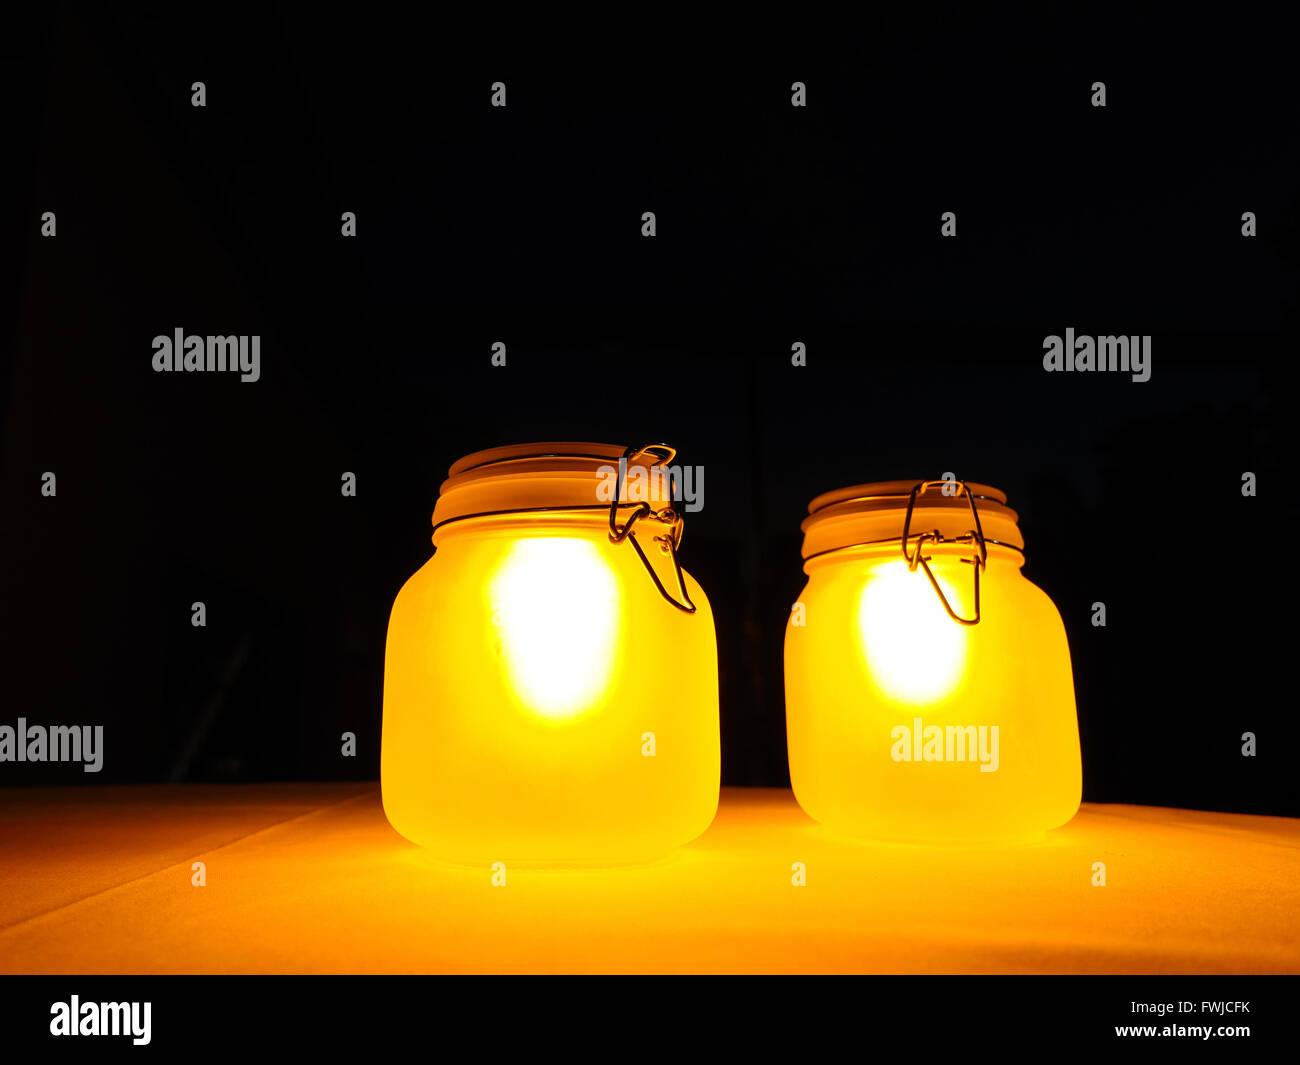 Close-Up Of Illuminated Lanterns On Table At Night - Stock Image